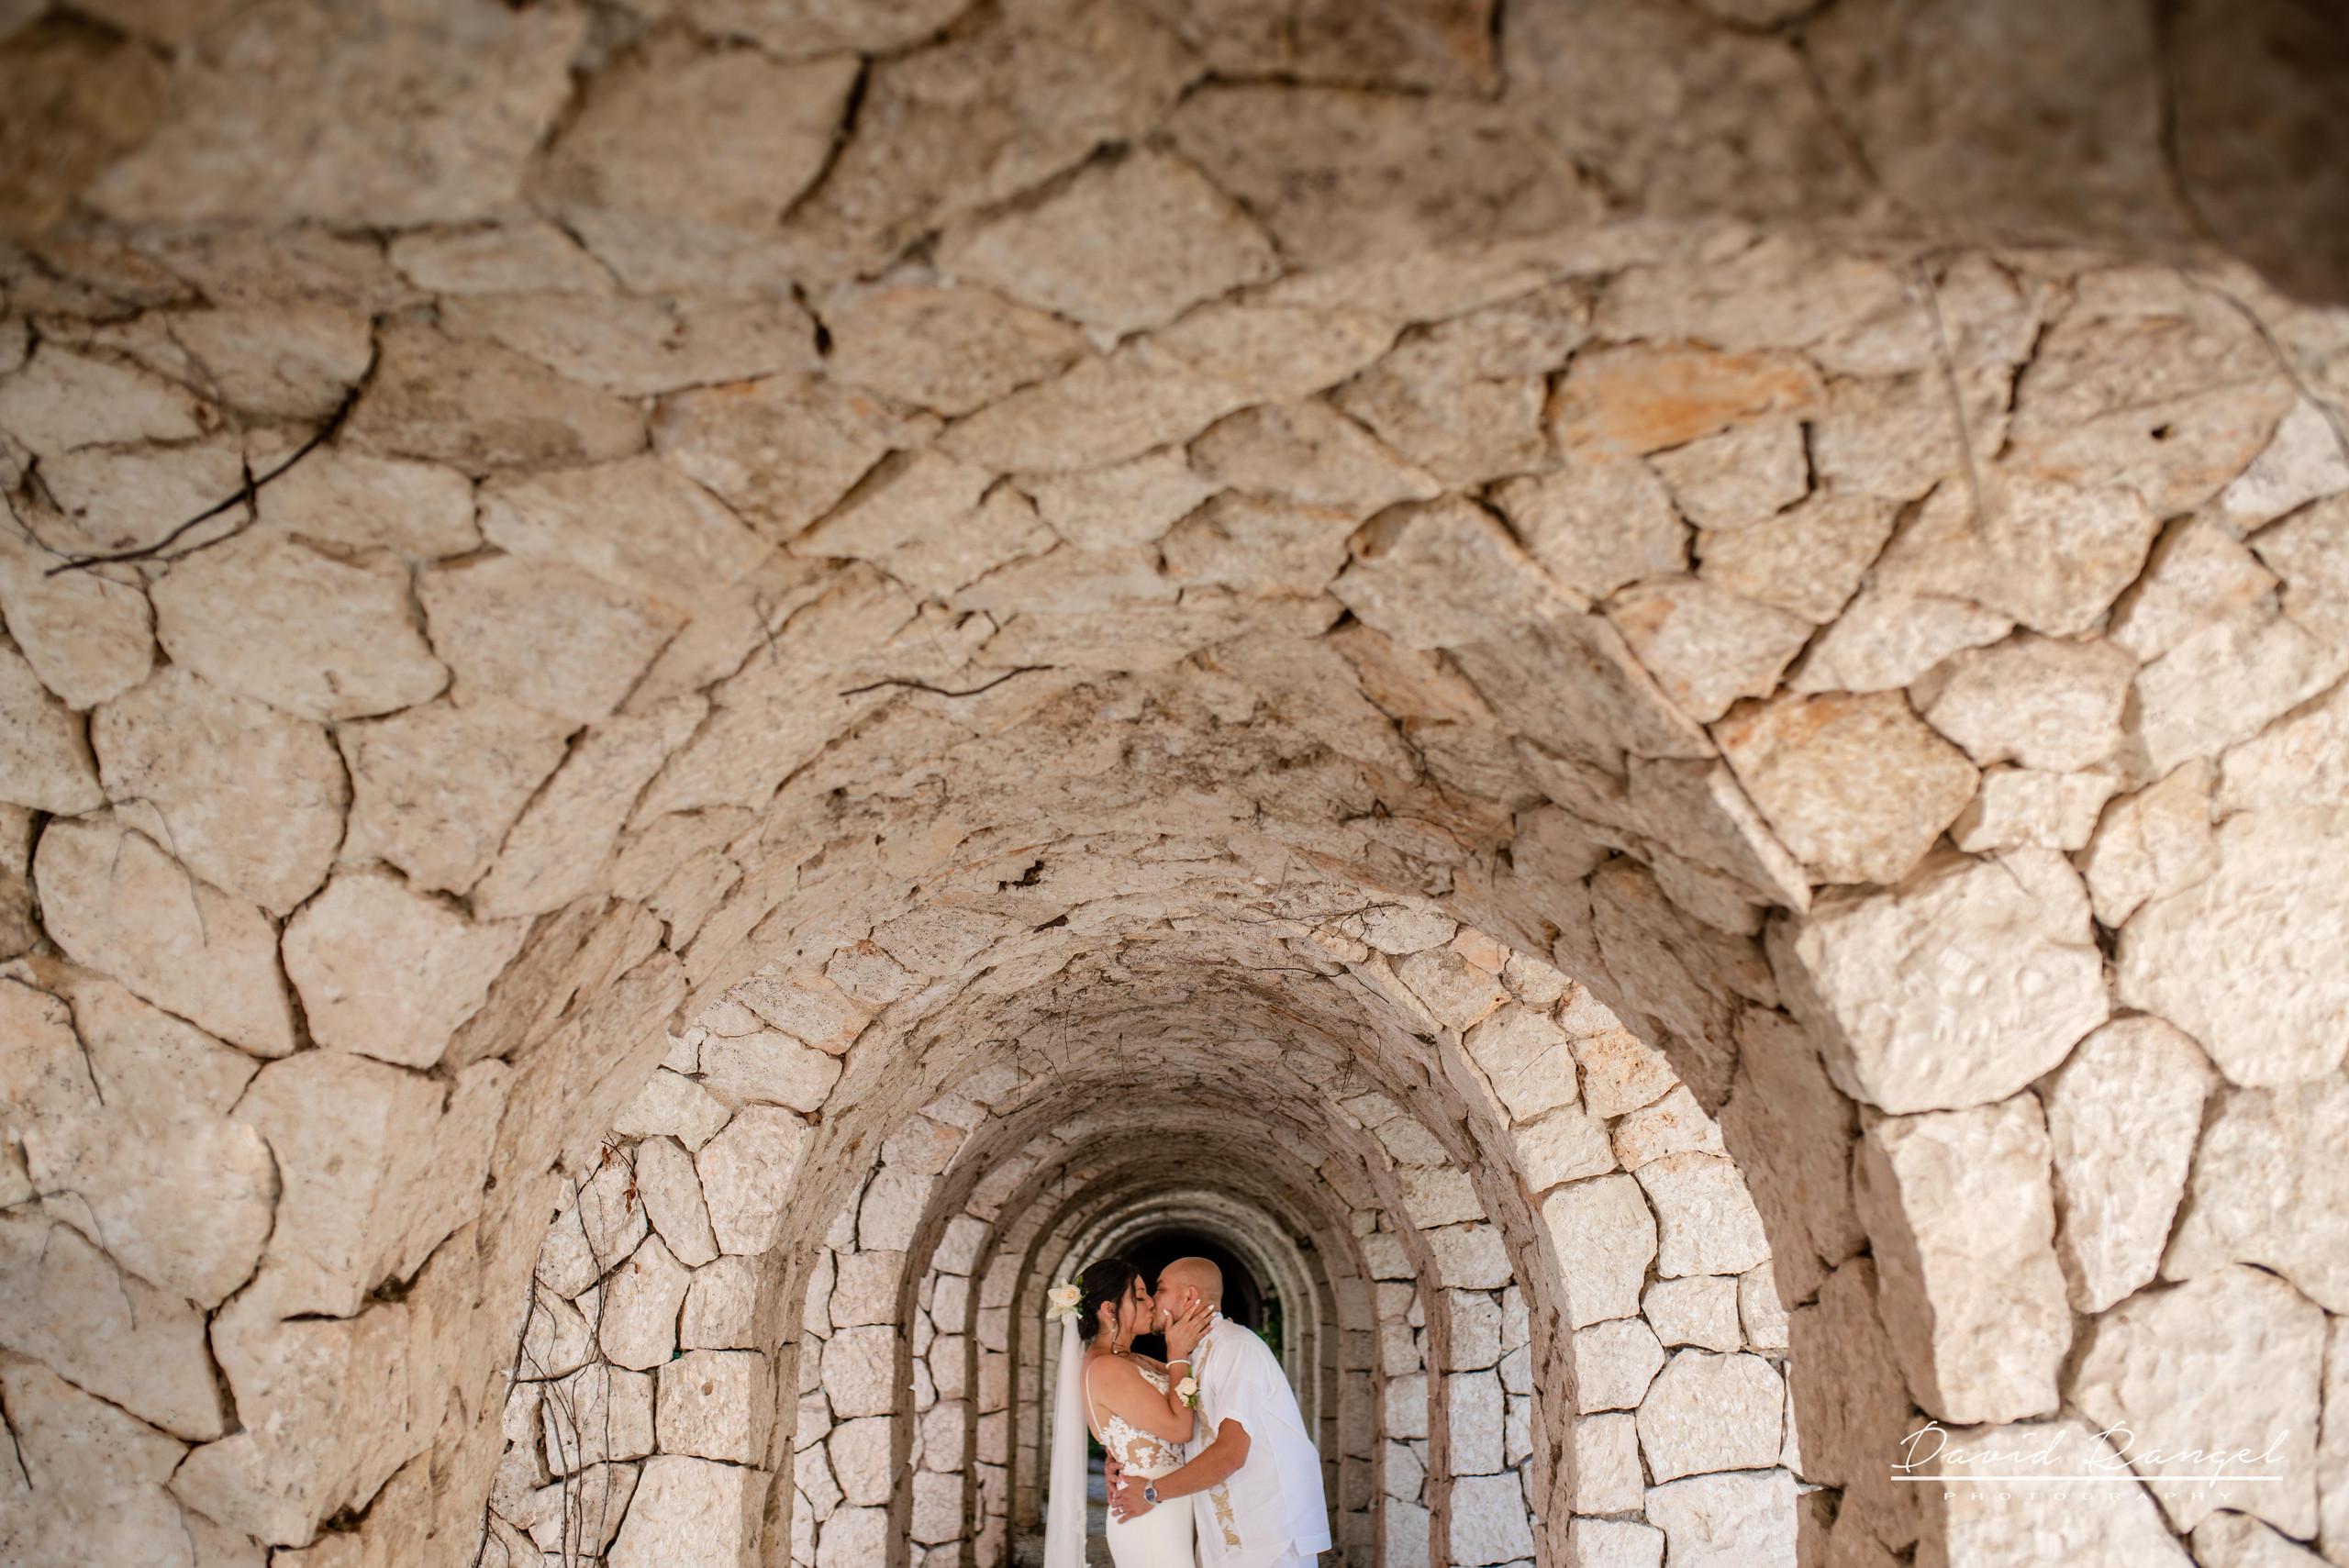 hugh+bride+groom+couple+session+photo+park+xcaret+church+love+kiss+wedding+coverage+dress